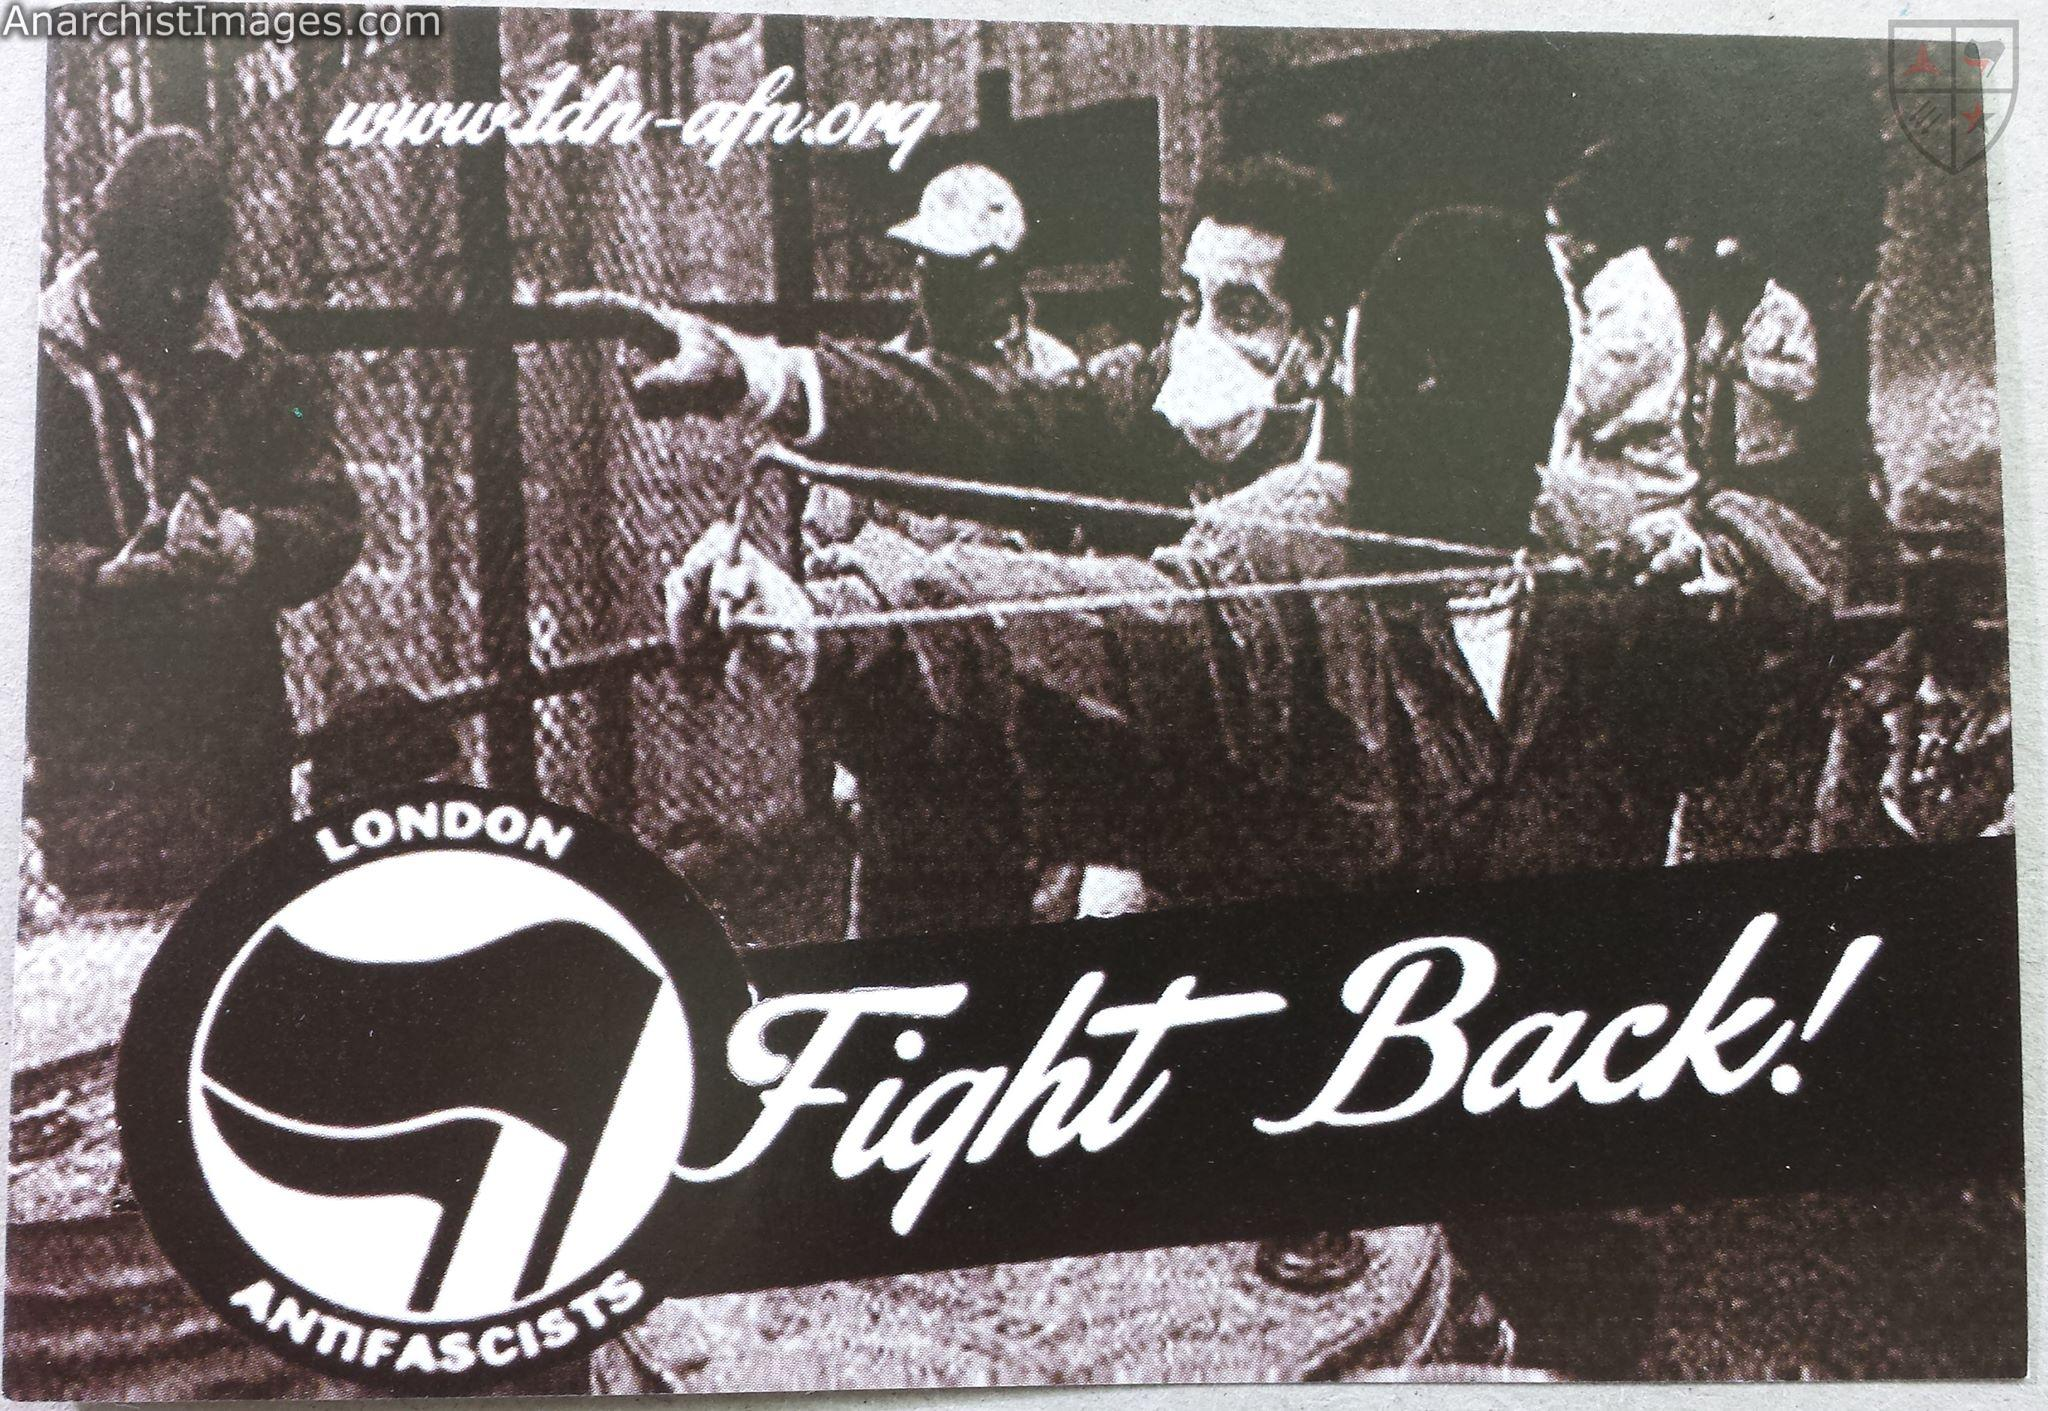 London Antifascists